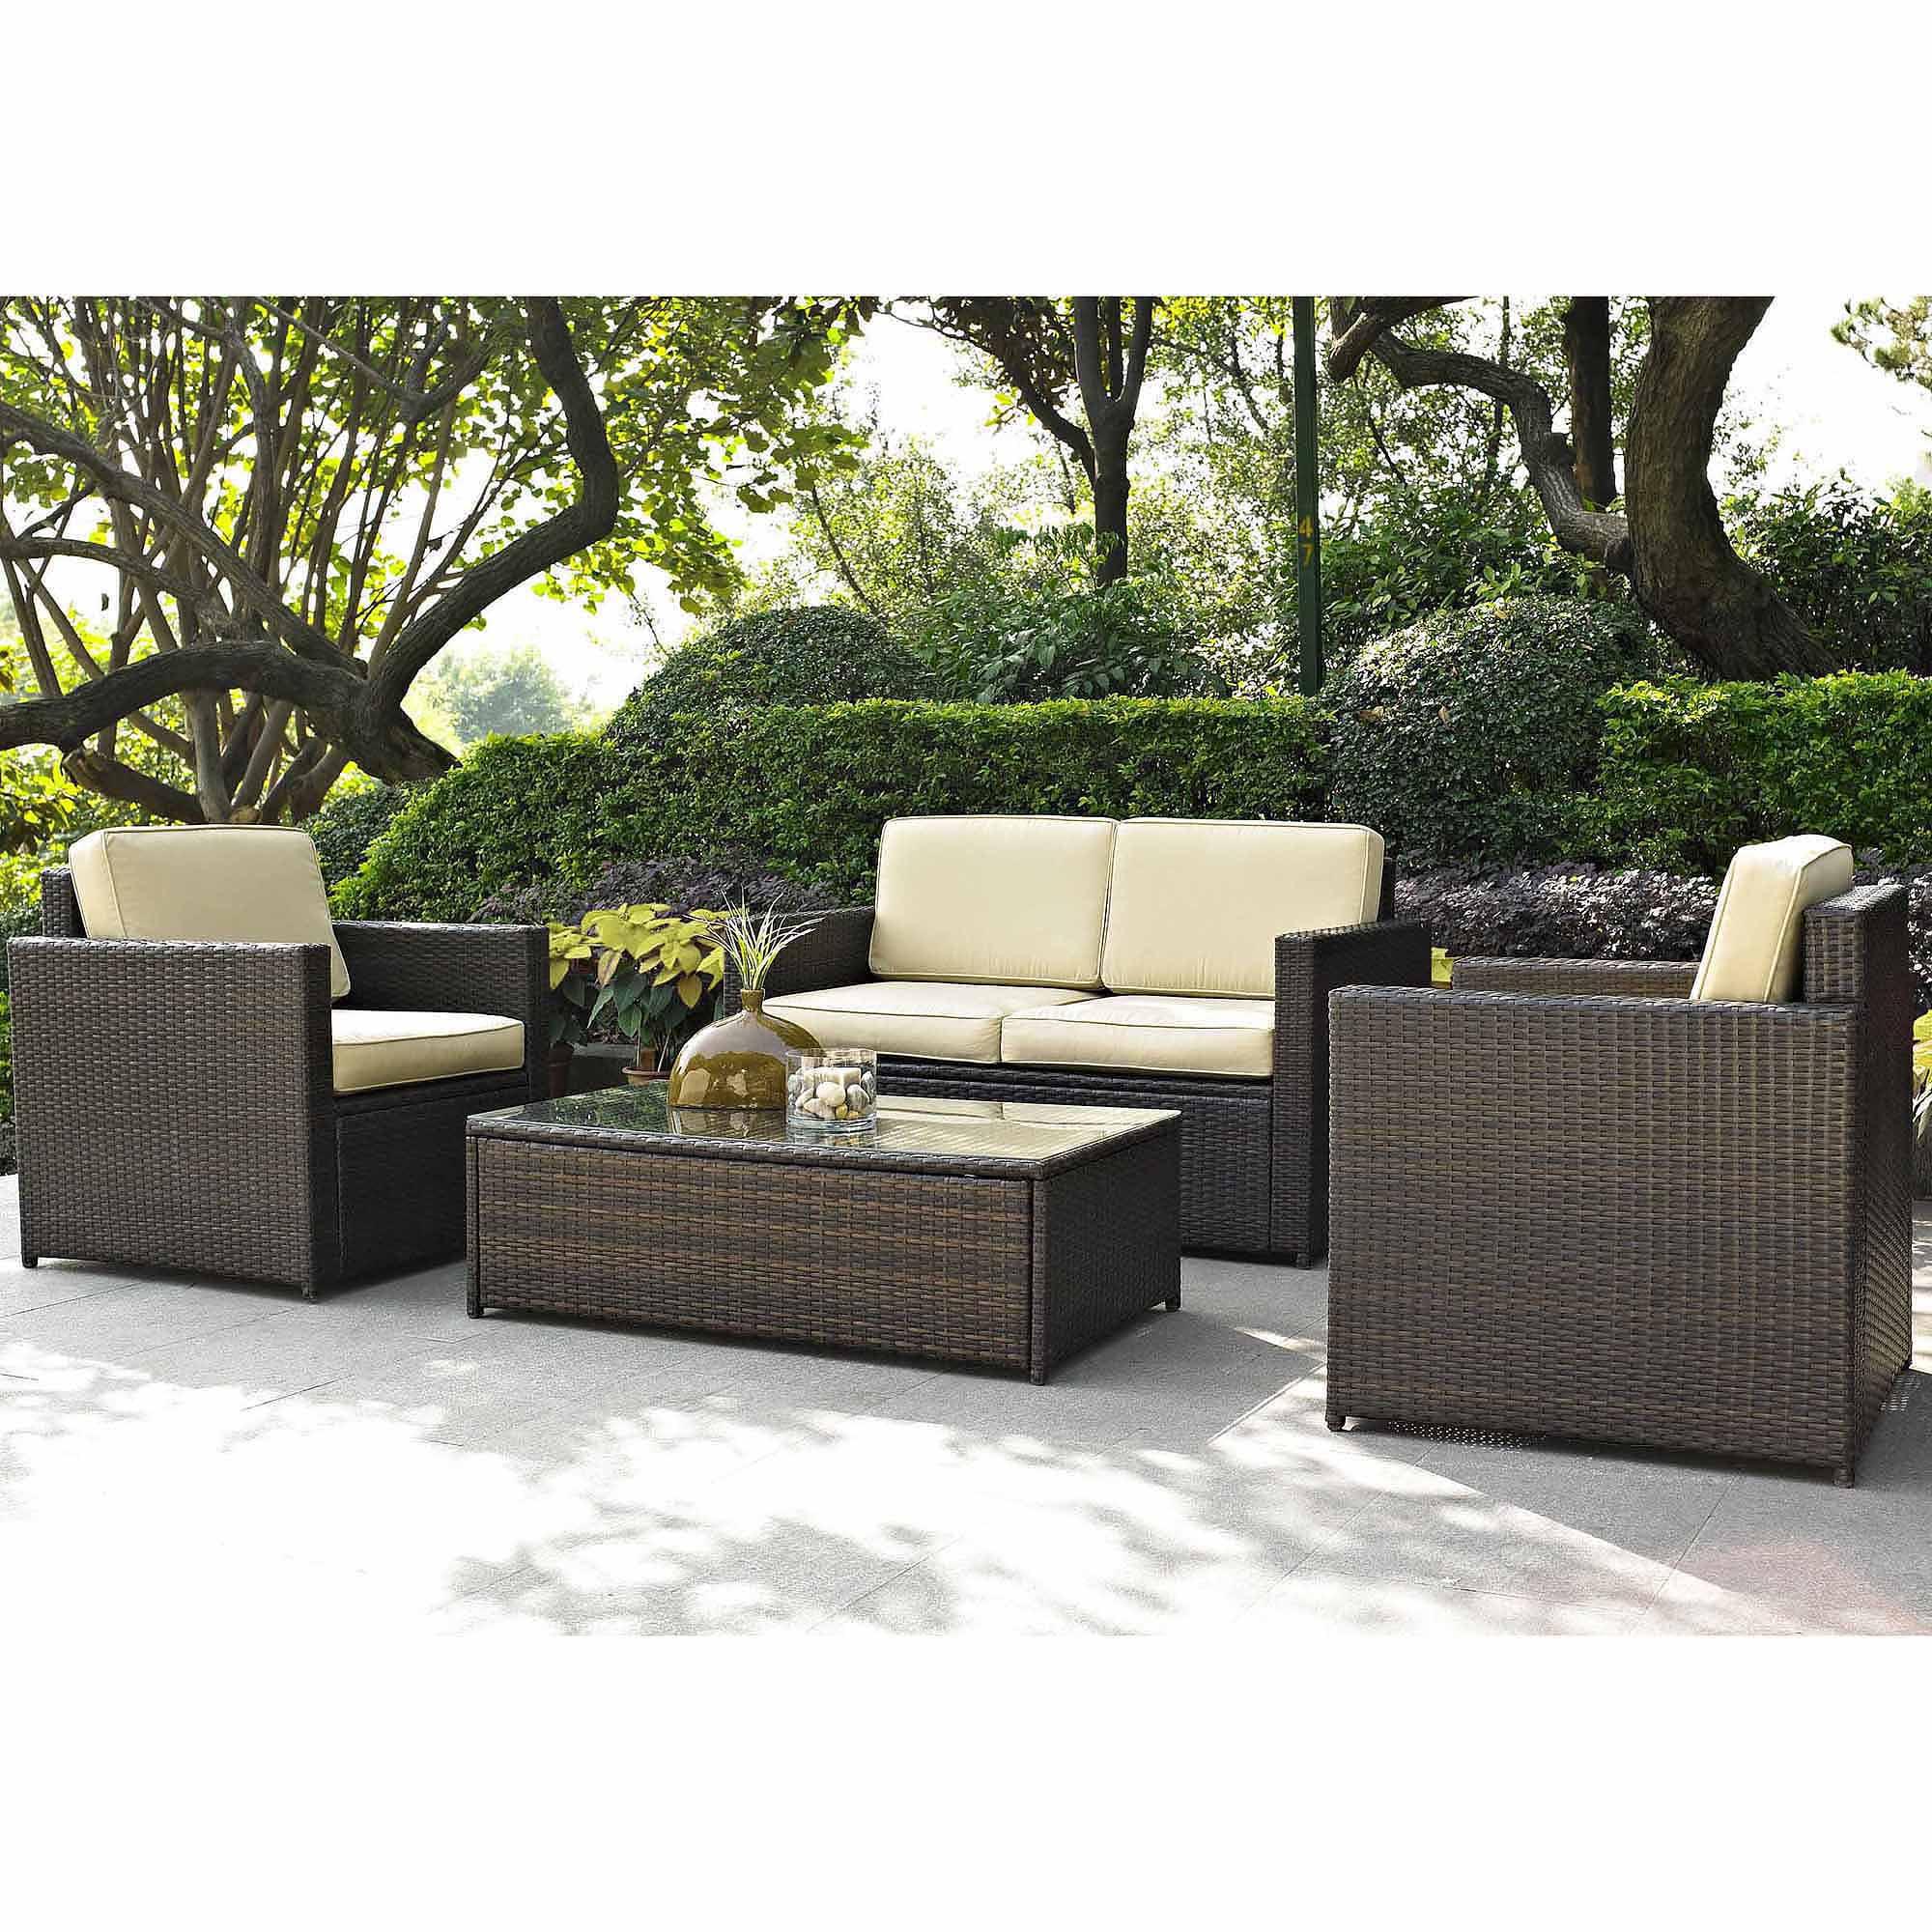 Best choice products outdoor garden patio 4pc cushioned seat black wicker sofa furniture set walmart com